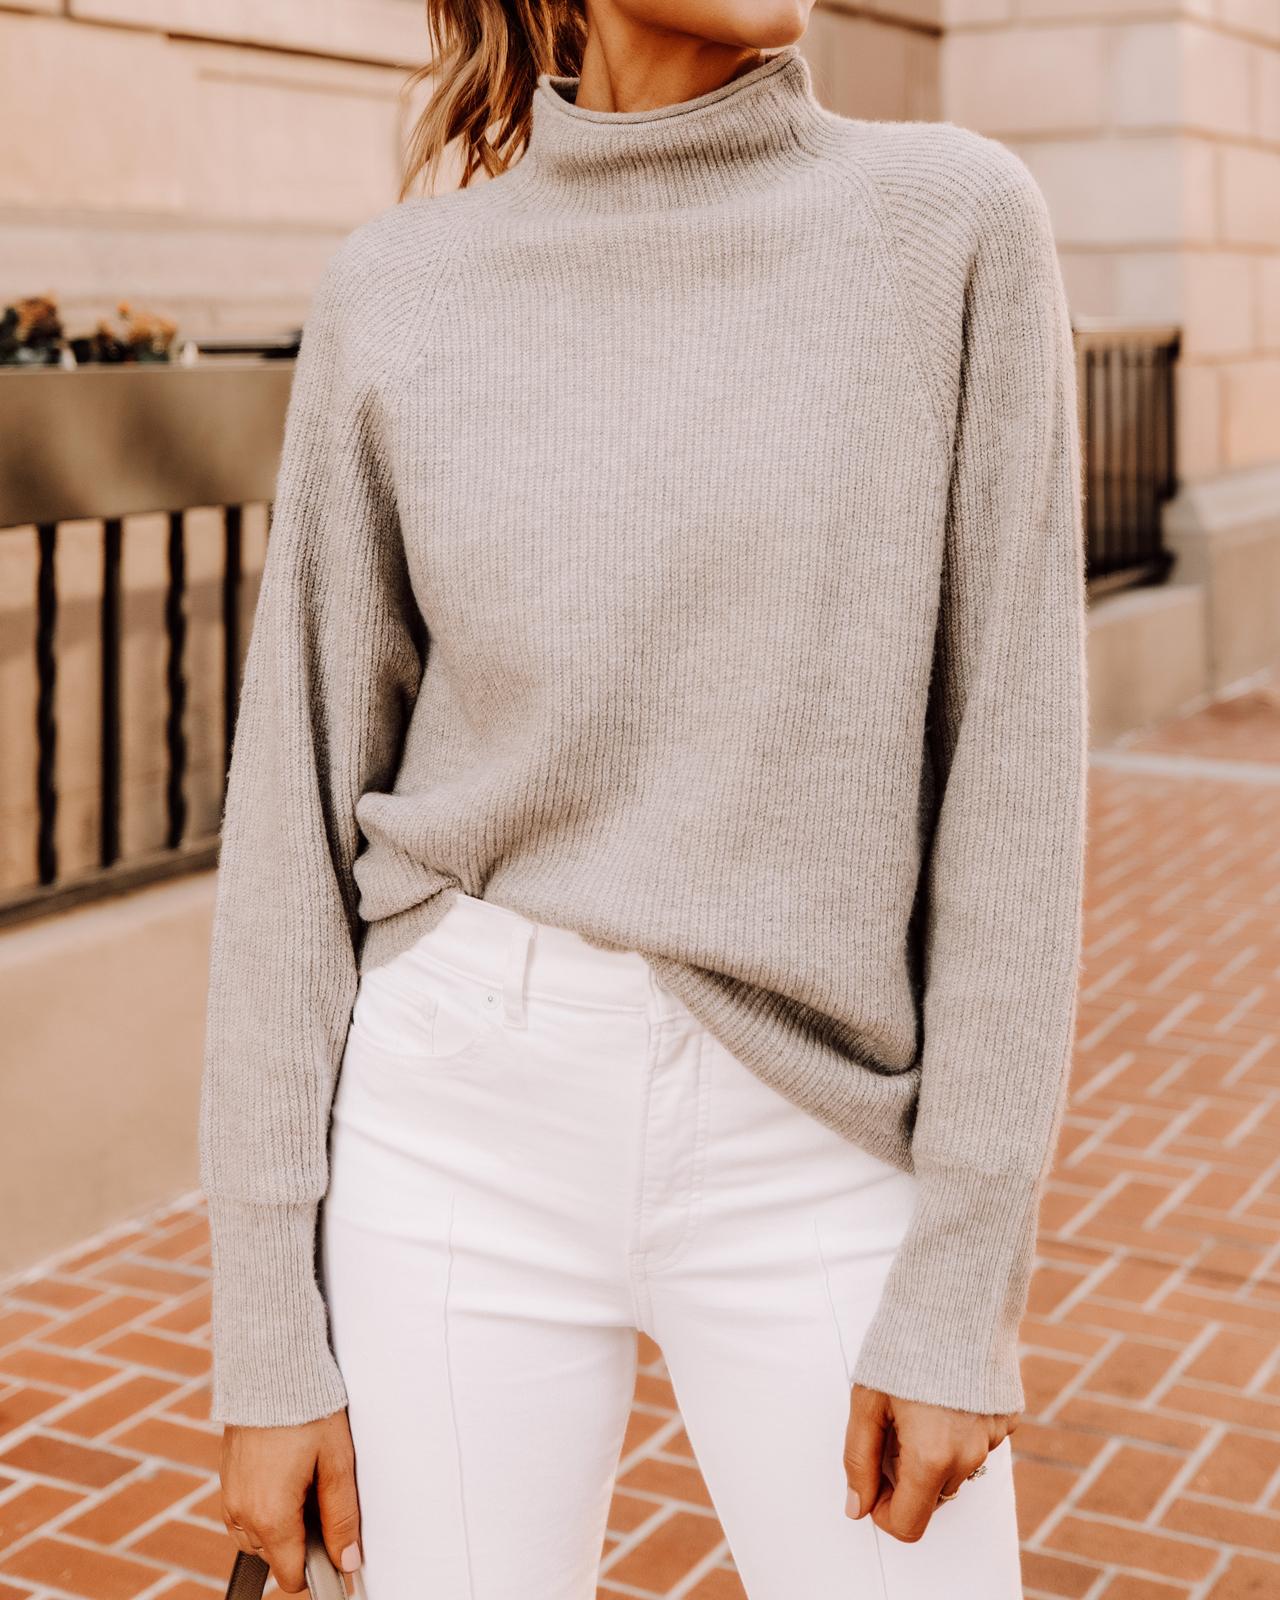 Fashion Jackson Wearing Express Beige Mock Neck Sweater